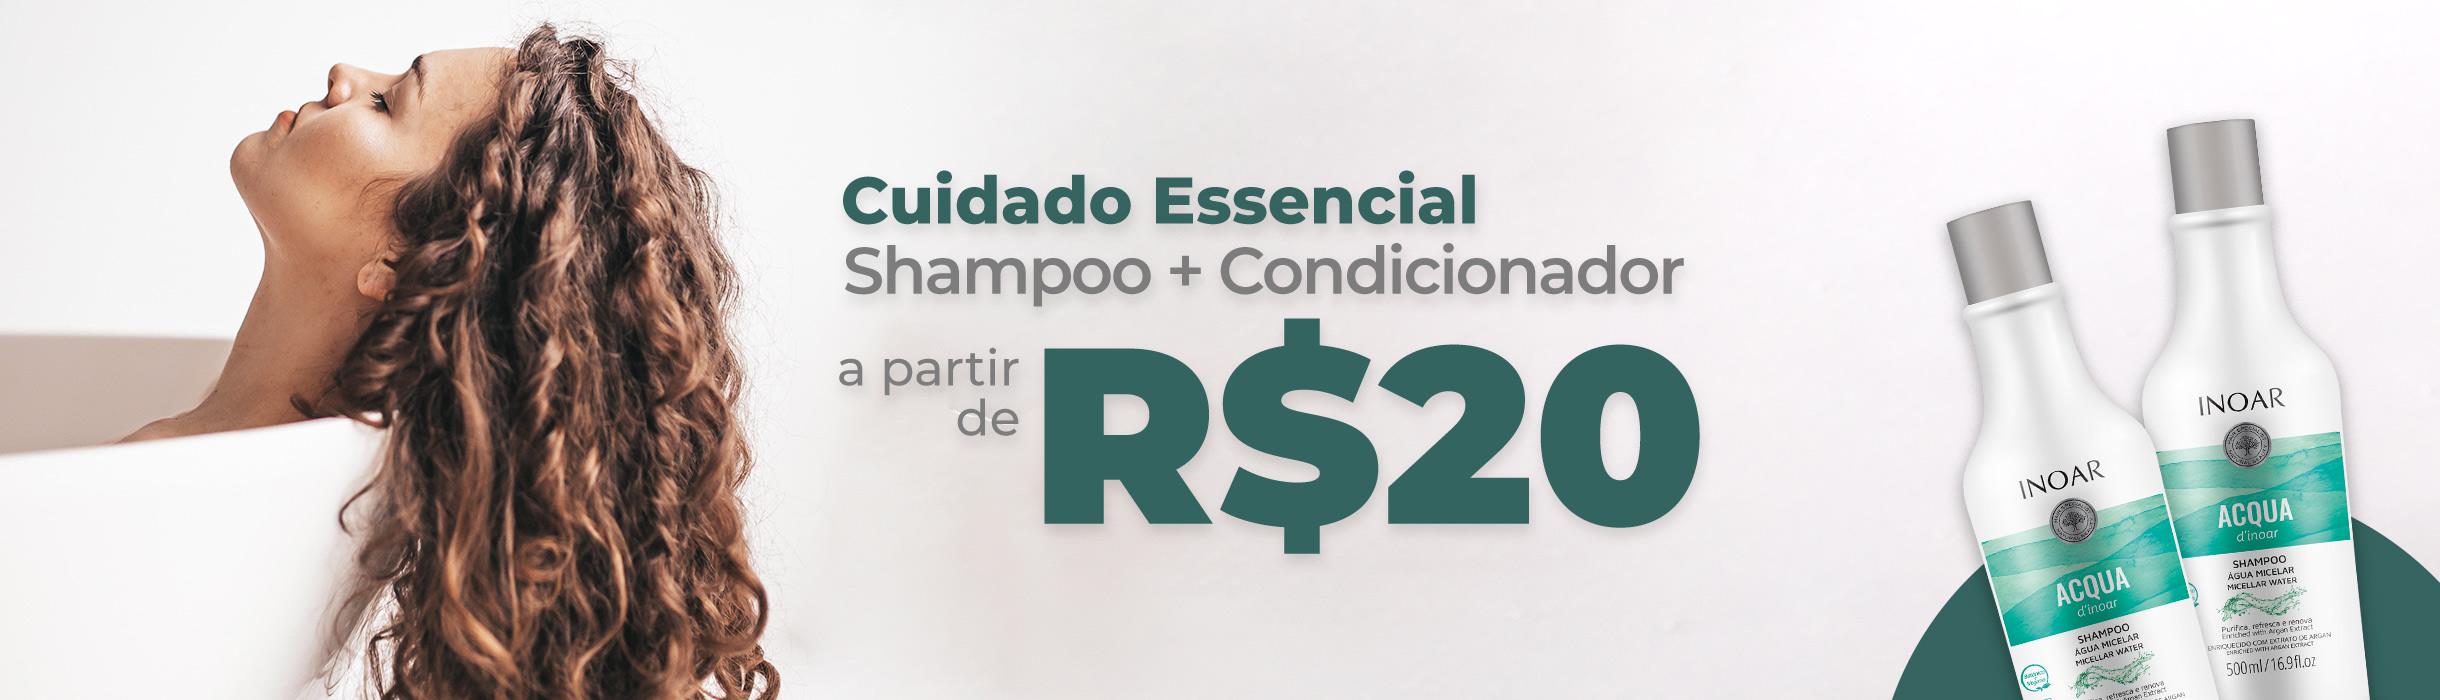 Shampoo + Condicionador a partir de 20 reais